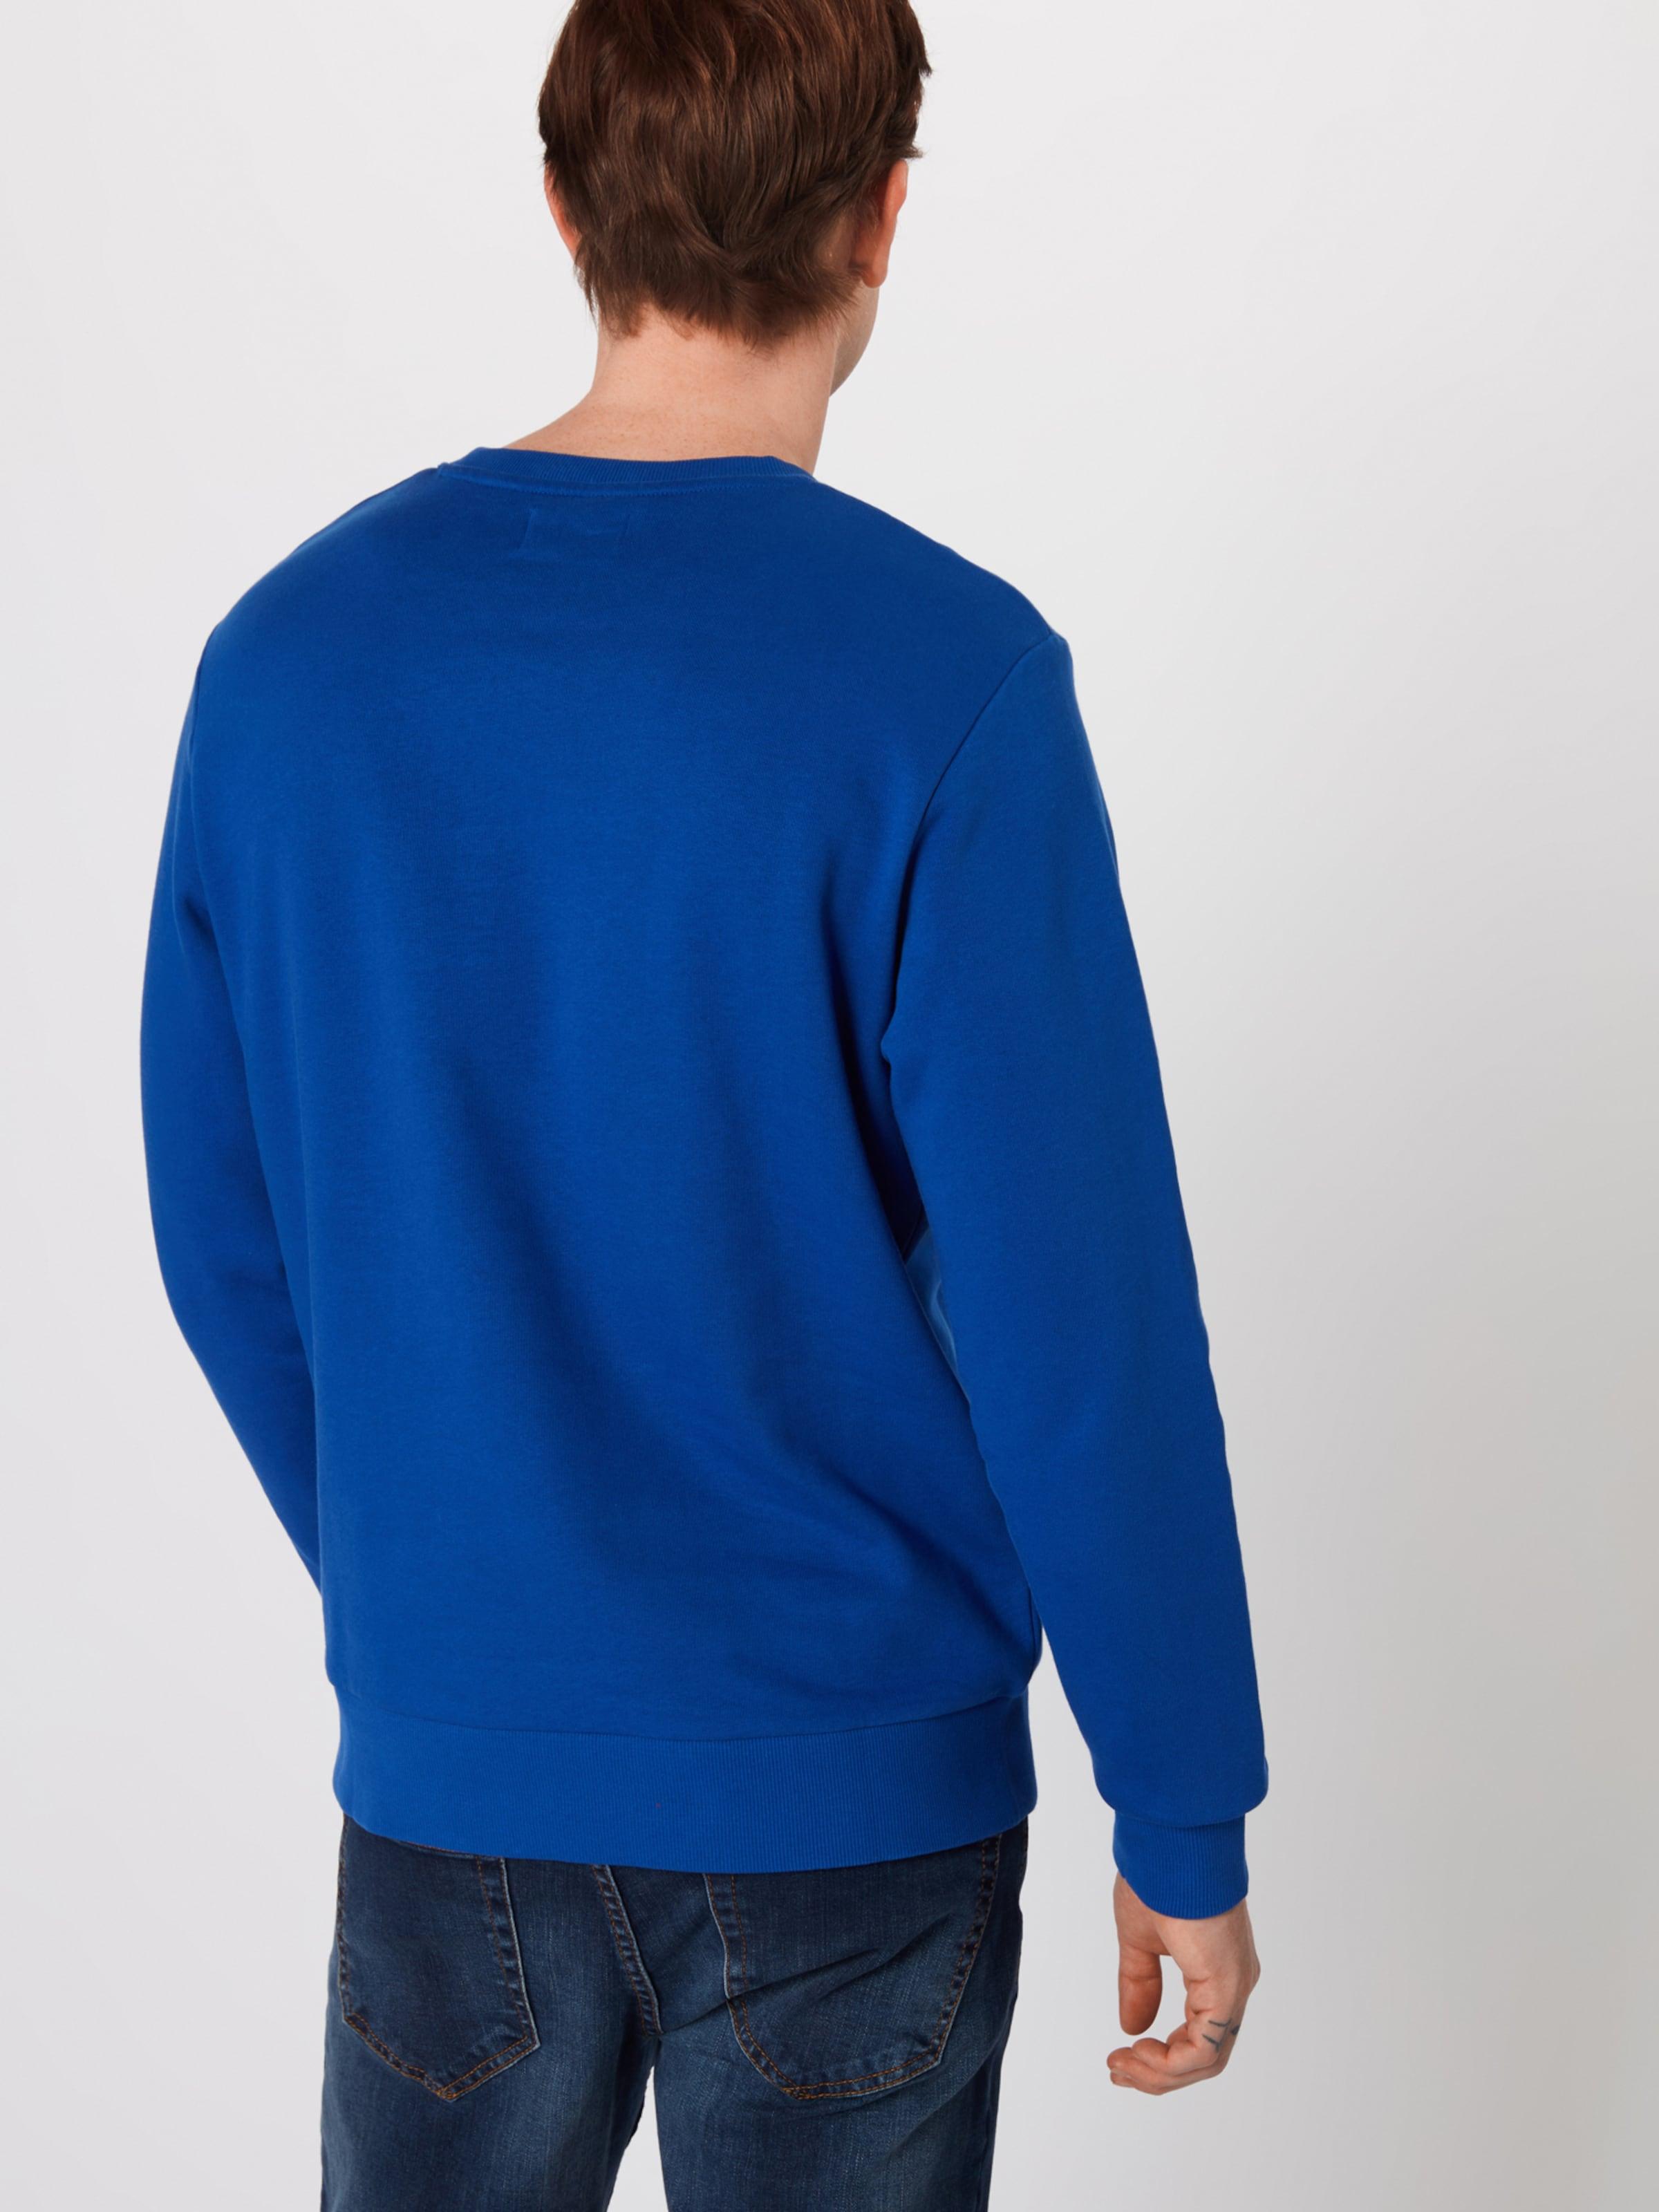 Jackamp; Sweat Empire BleuRose 'jorart Jones Crew shirt Sweat Neck' En K1FJcl